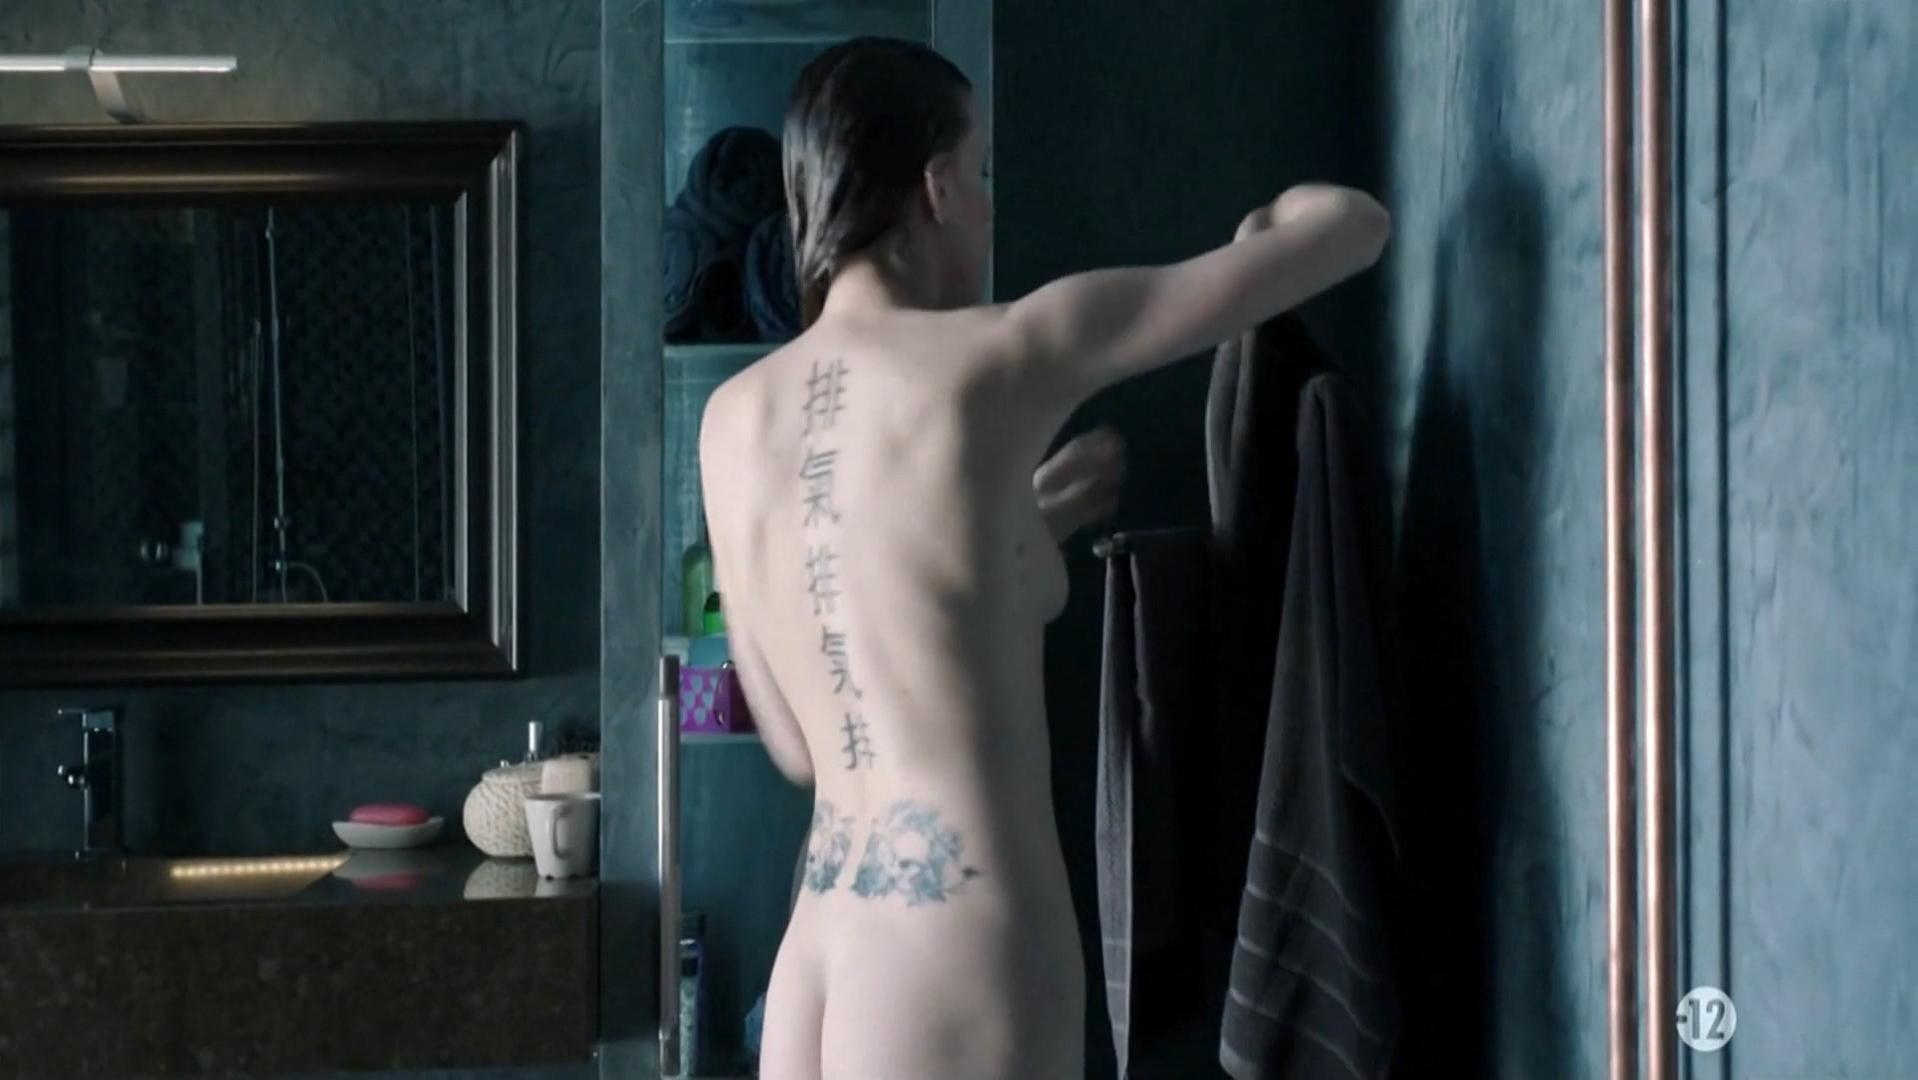 Juliette Dol nude, Evelinn Kostova nude - Section Zero s01e01 (2016)